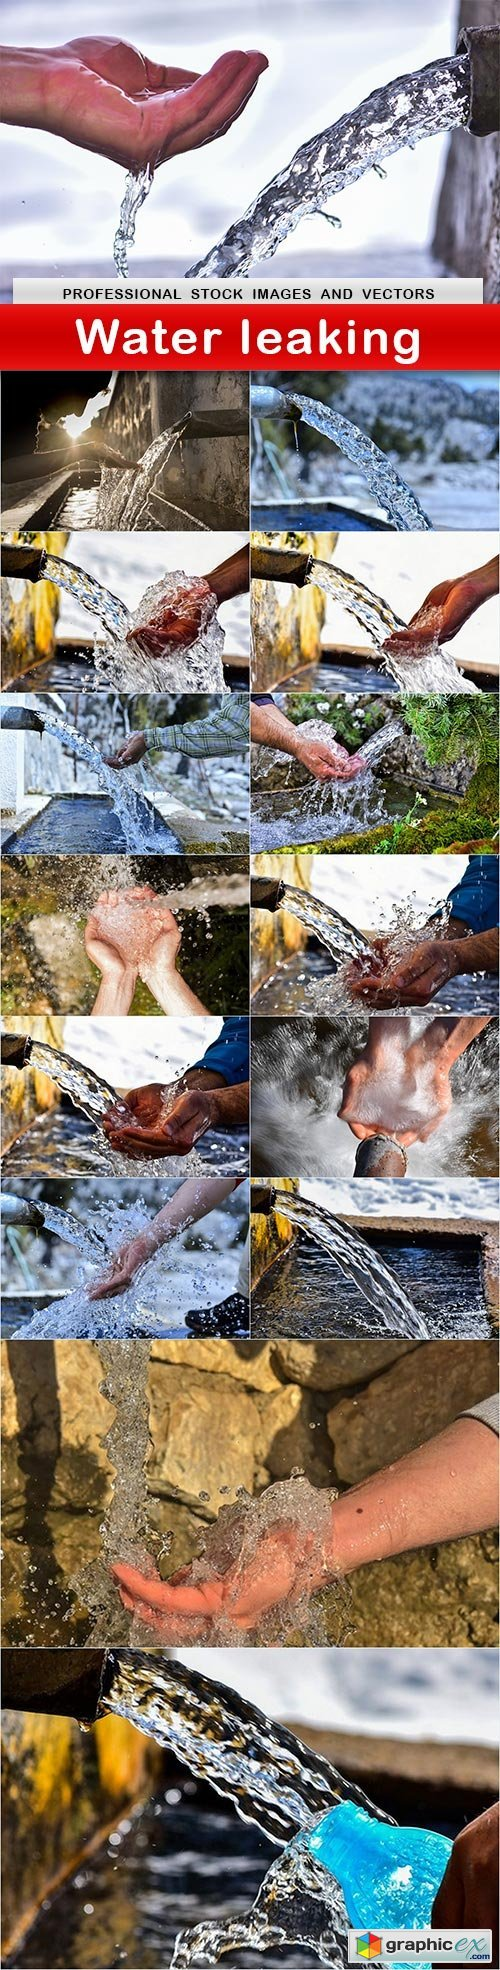 Water leaking - 15 UHQ JPEG